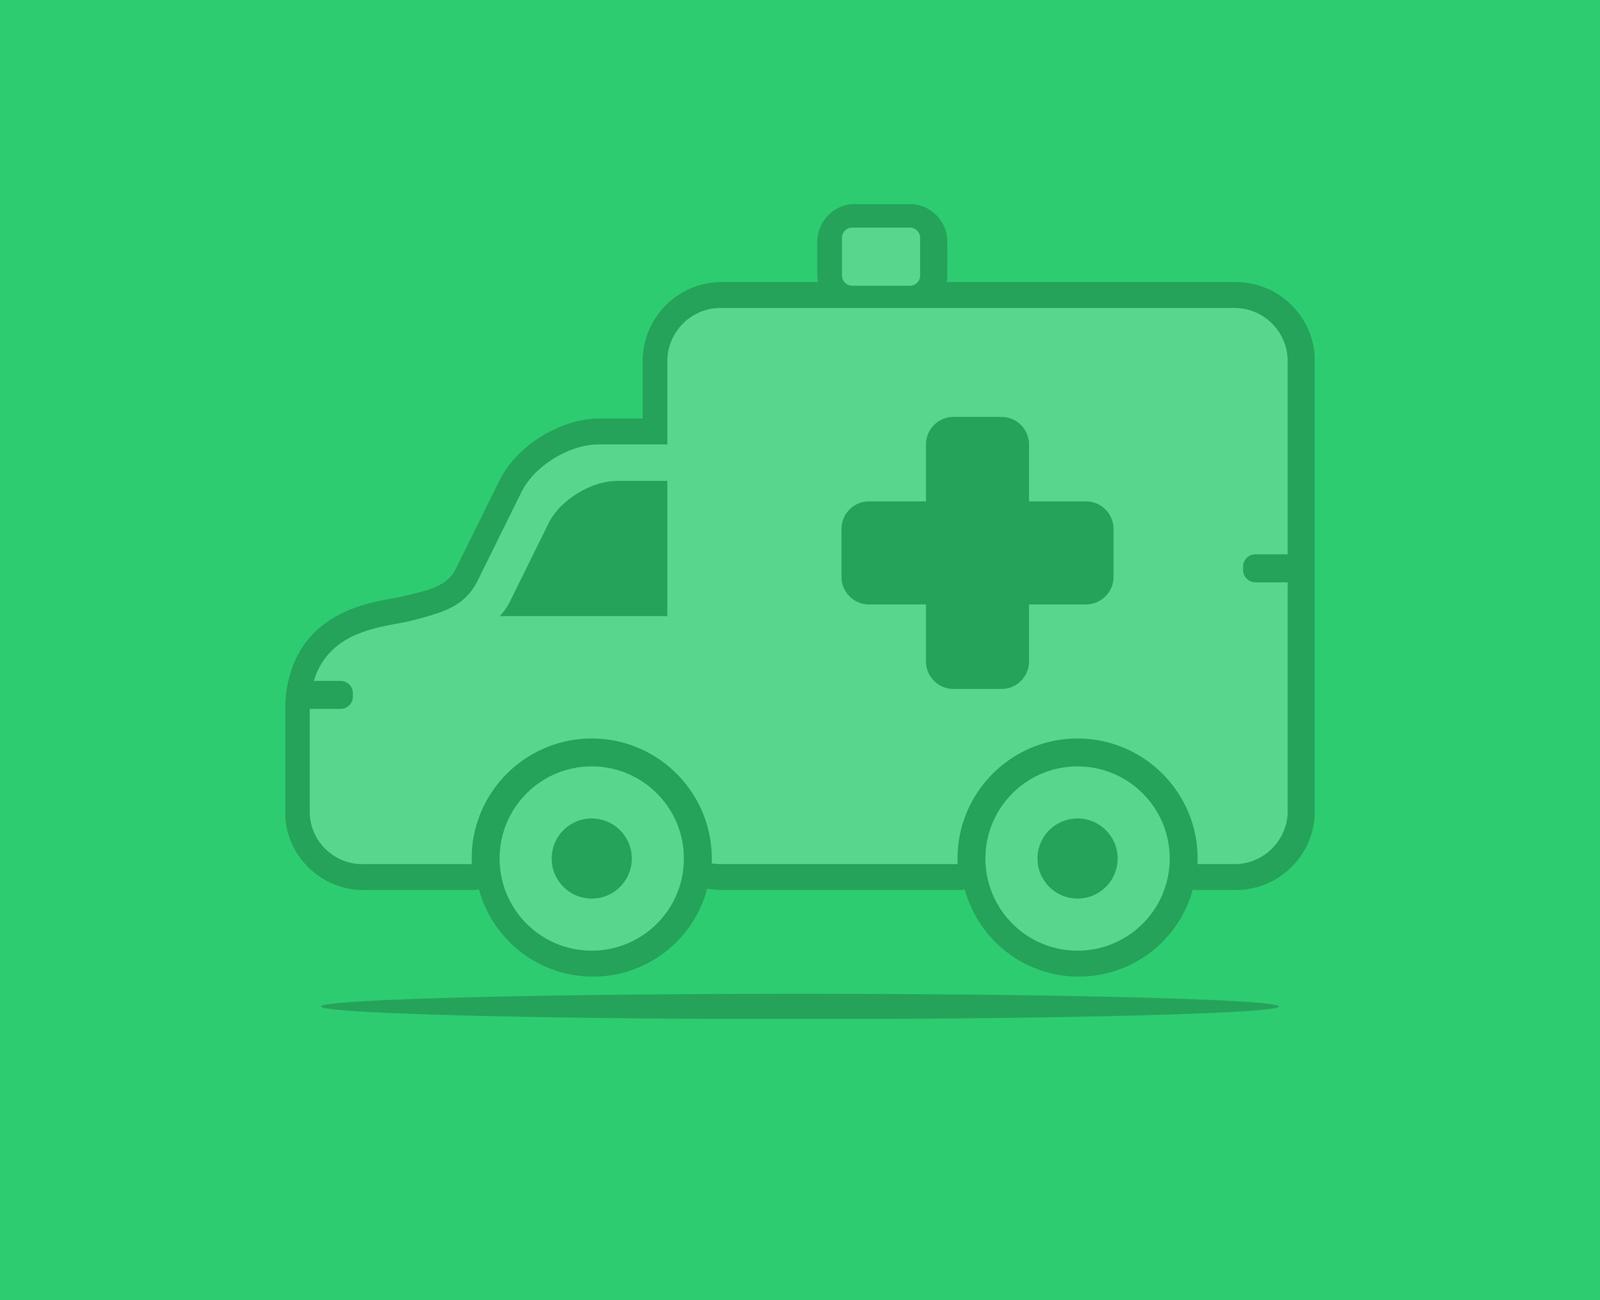 New topics in emergency medicine - Emergency Medicine